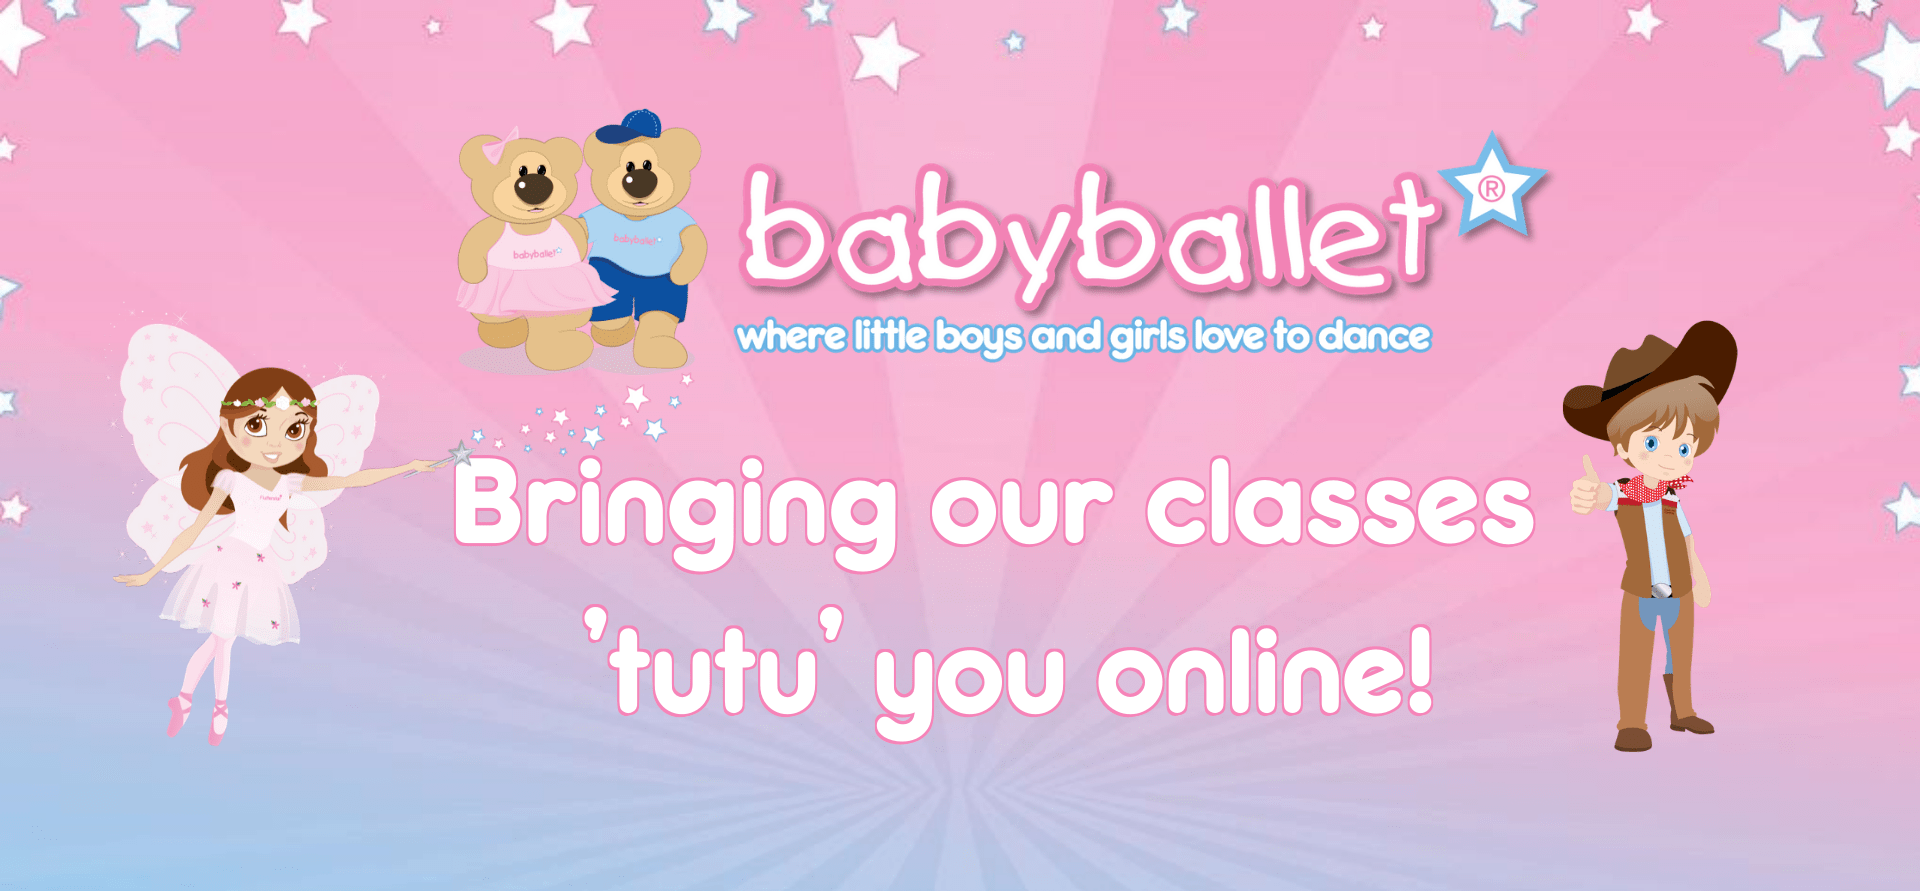 Coronavirus measures at babyballet. Virtual dance classes taking place across the UK